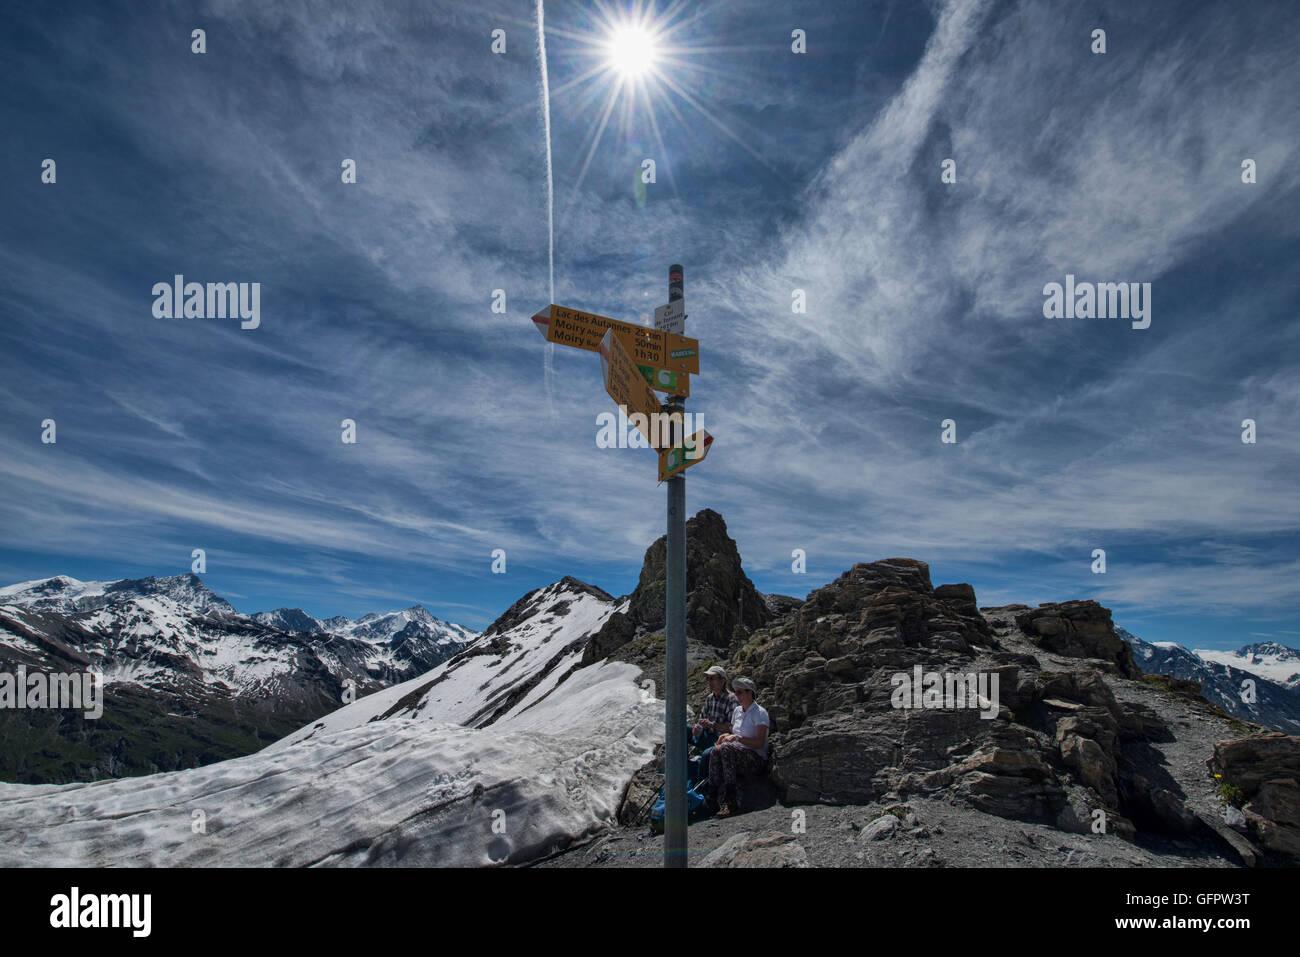 Haute Route Wanderer auf dem Gipfel Col de Torrent, Val d'Hérens, Schweiz Stockbild